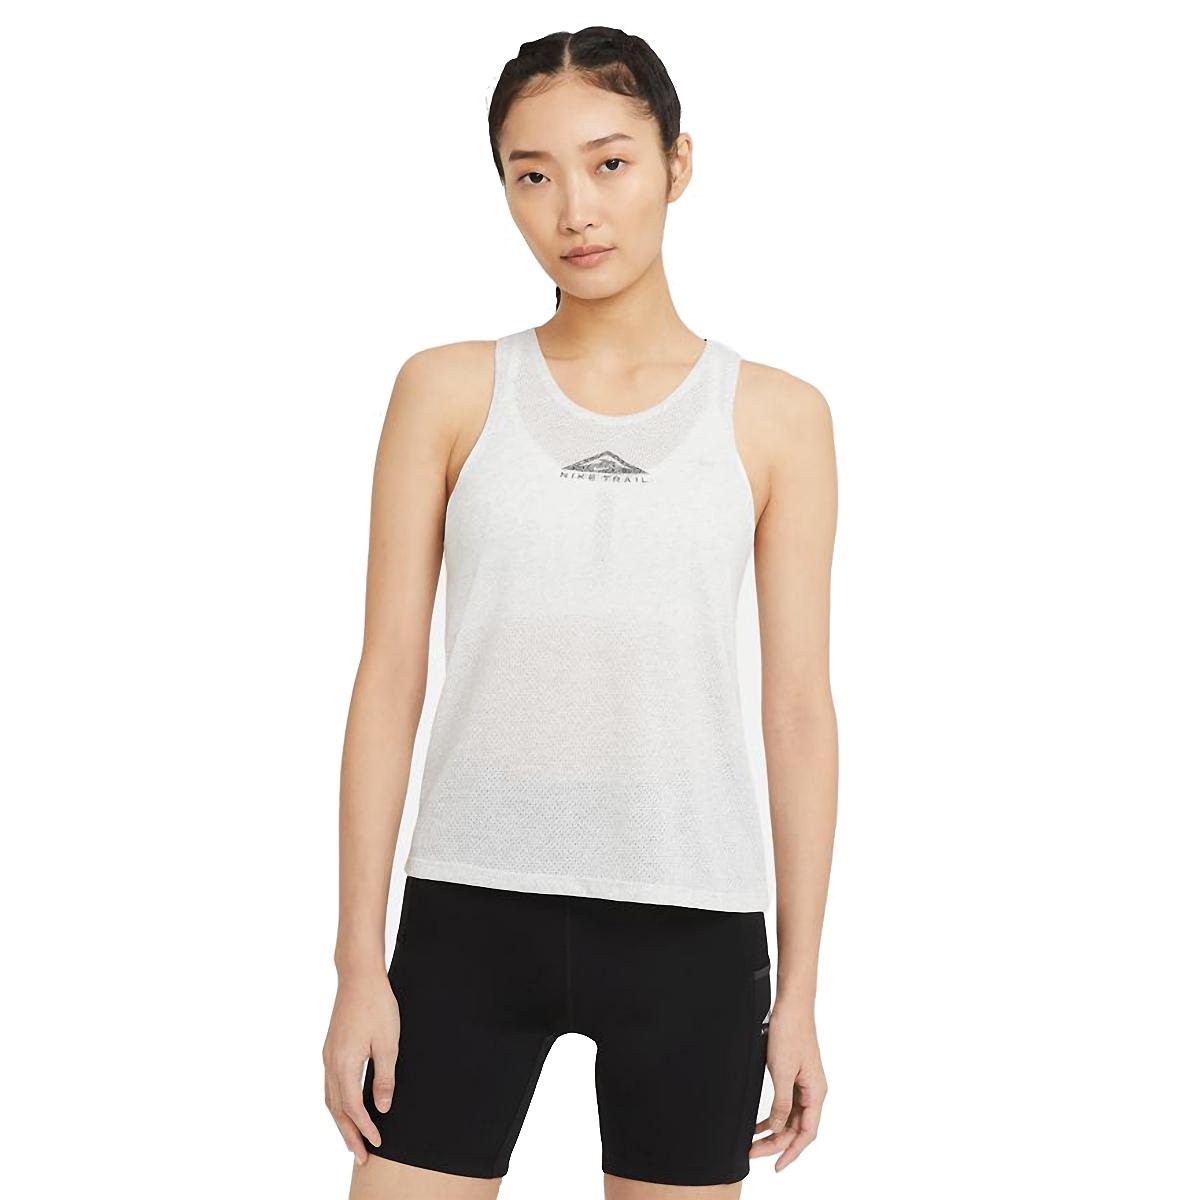 Women's Nike City Sleek Trail Running Tank - Color: Light Smoke Grey/Grey Fog/Reflective Silver - Size: XS, Light Smoke Grey/Grey Fog/Reflective Silver, large, image 1